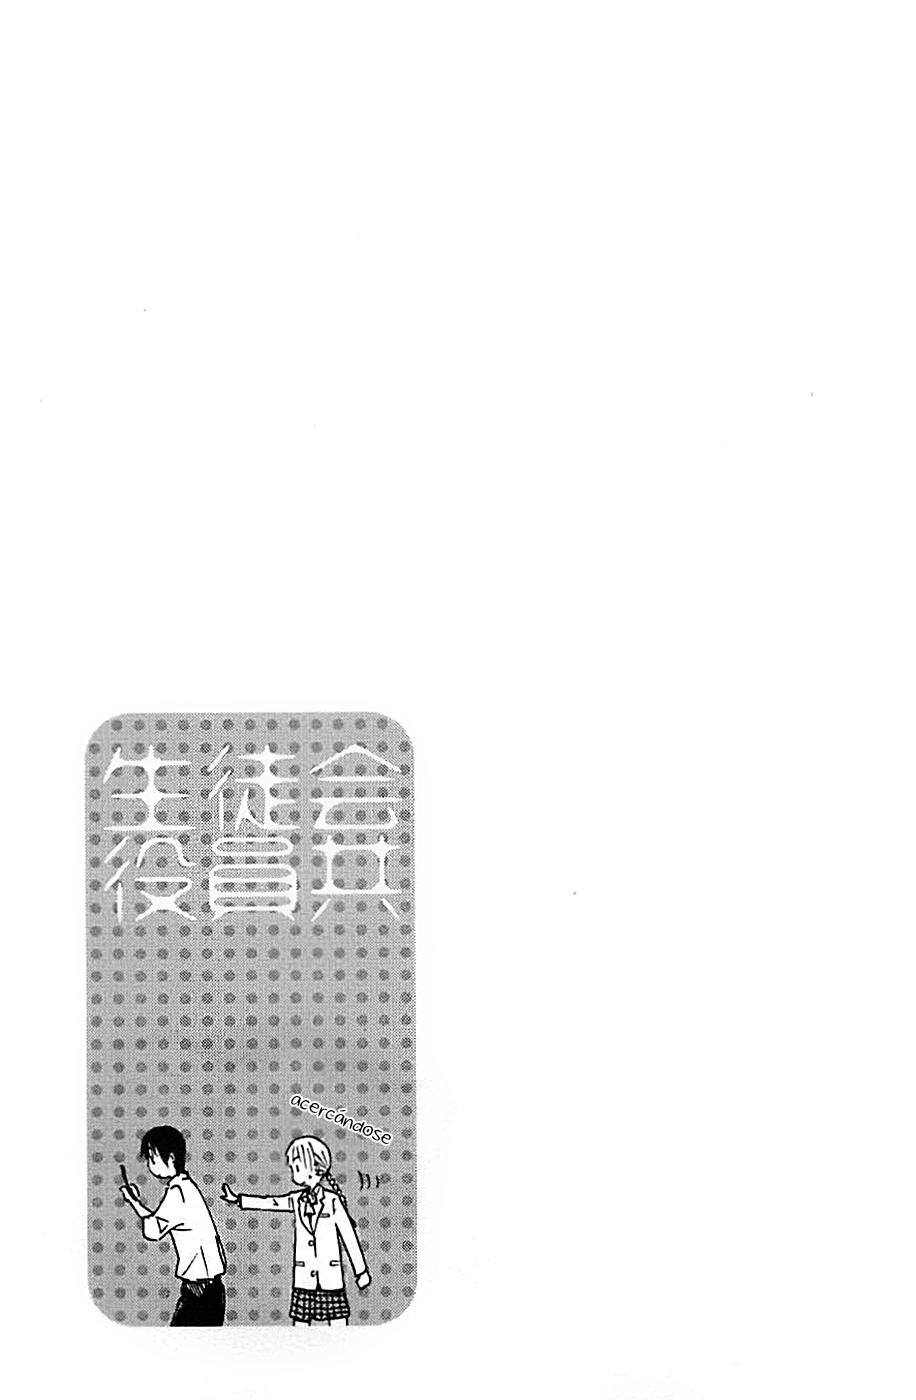 http://c5.ninemanga.com/es_manga/2/17602/412442/45bea76d85f0369f4ce7ac9253f9d5cb.jpg Page 6